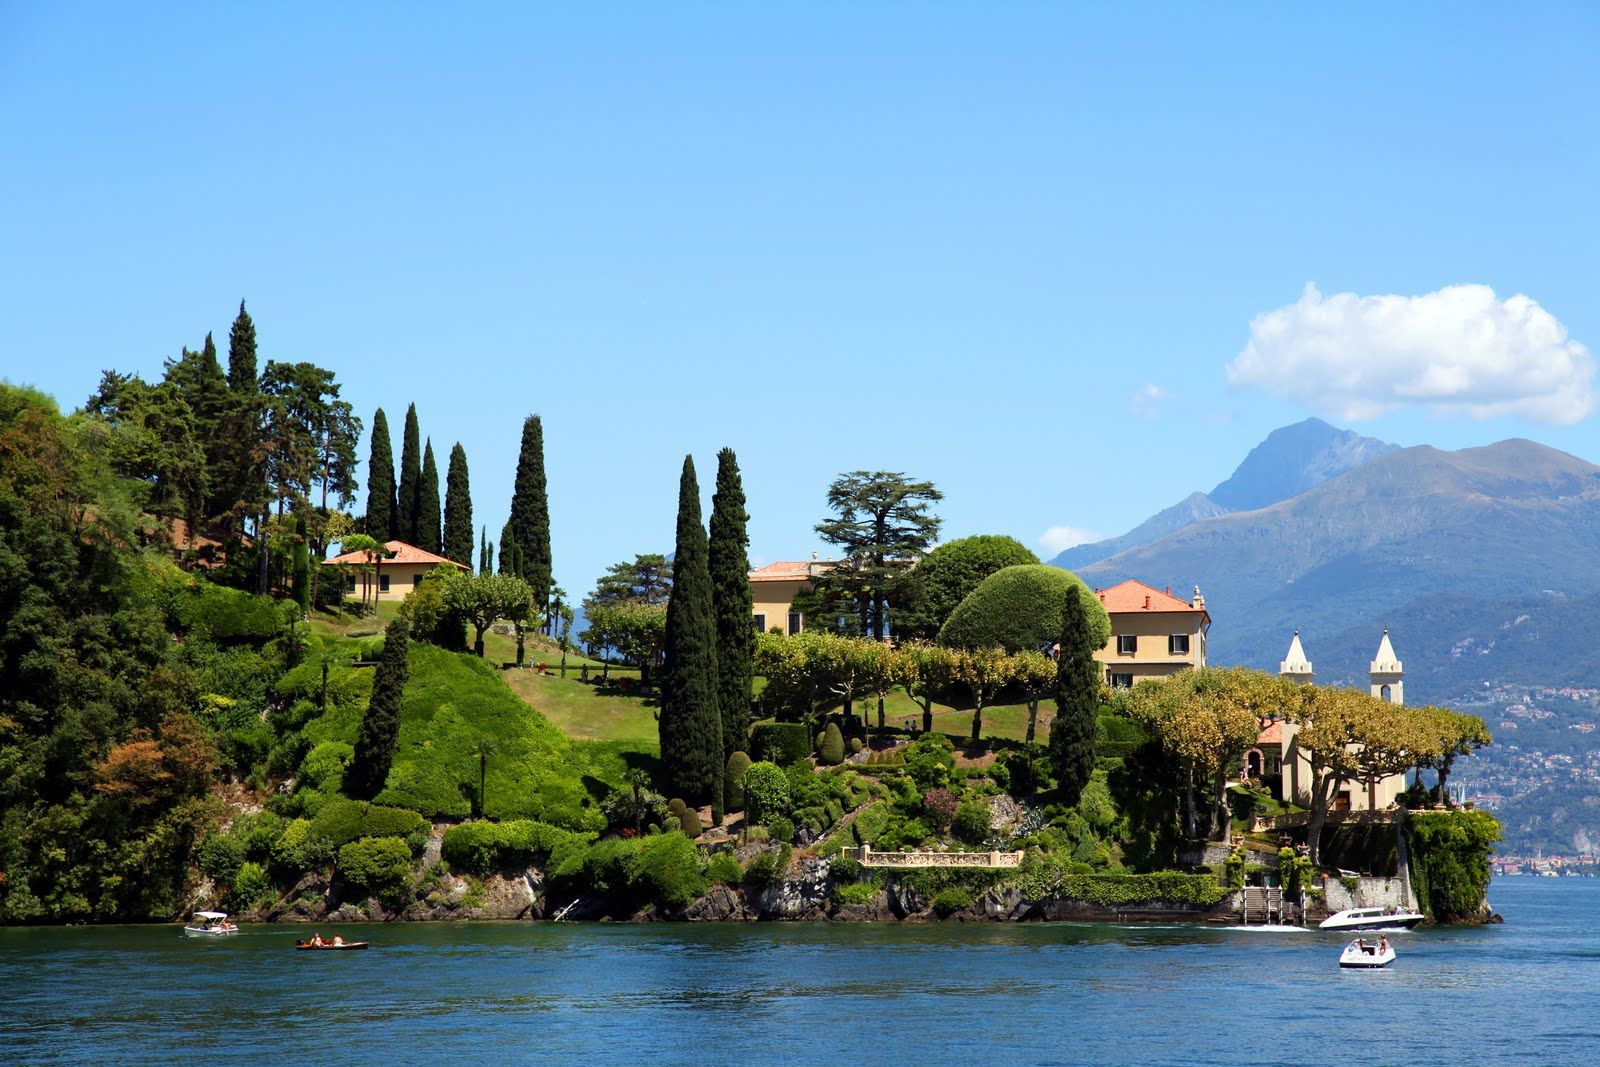 Lake Como - Wikipedia